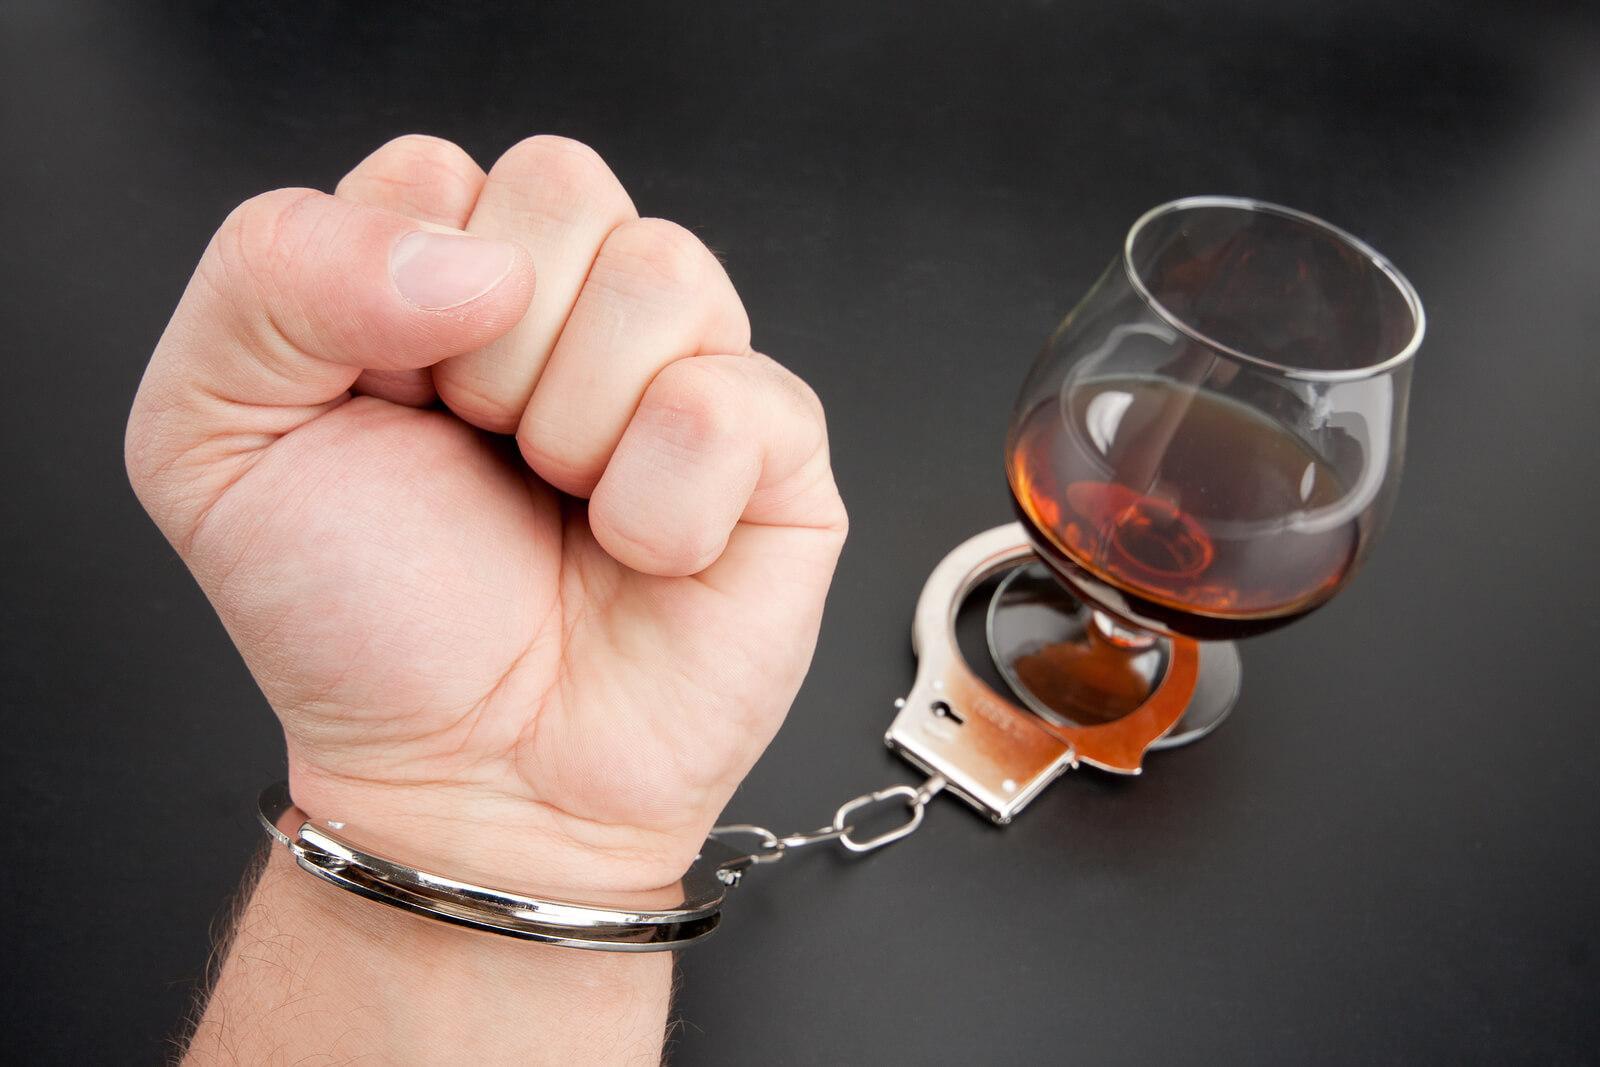 Картинки по запросу Камни от алкоголизма, курения (избавляющие от зависимости)